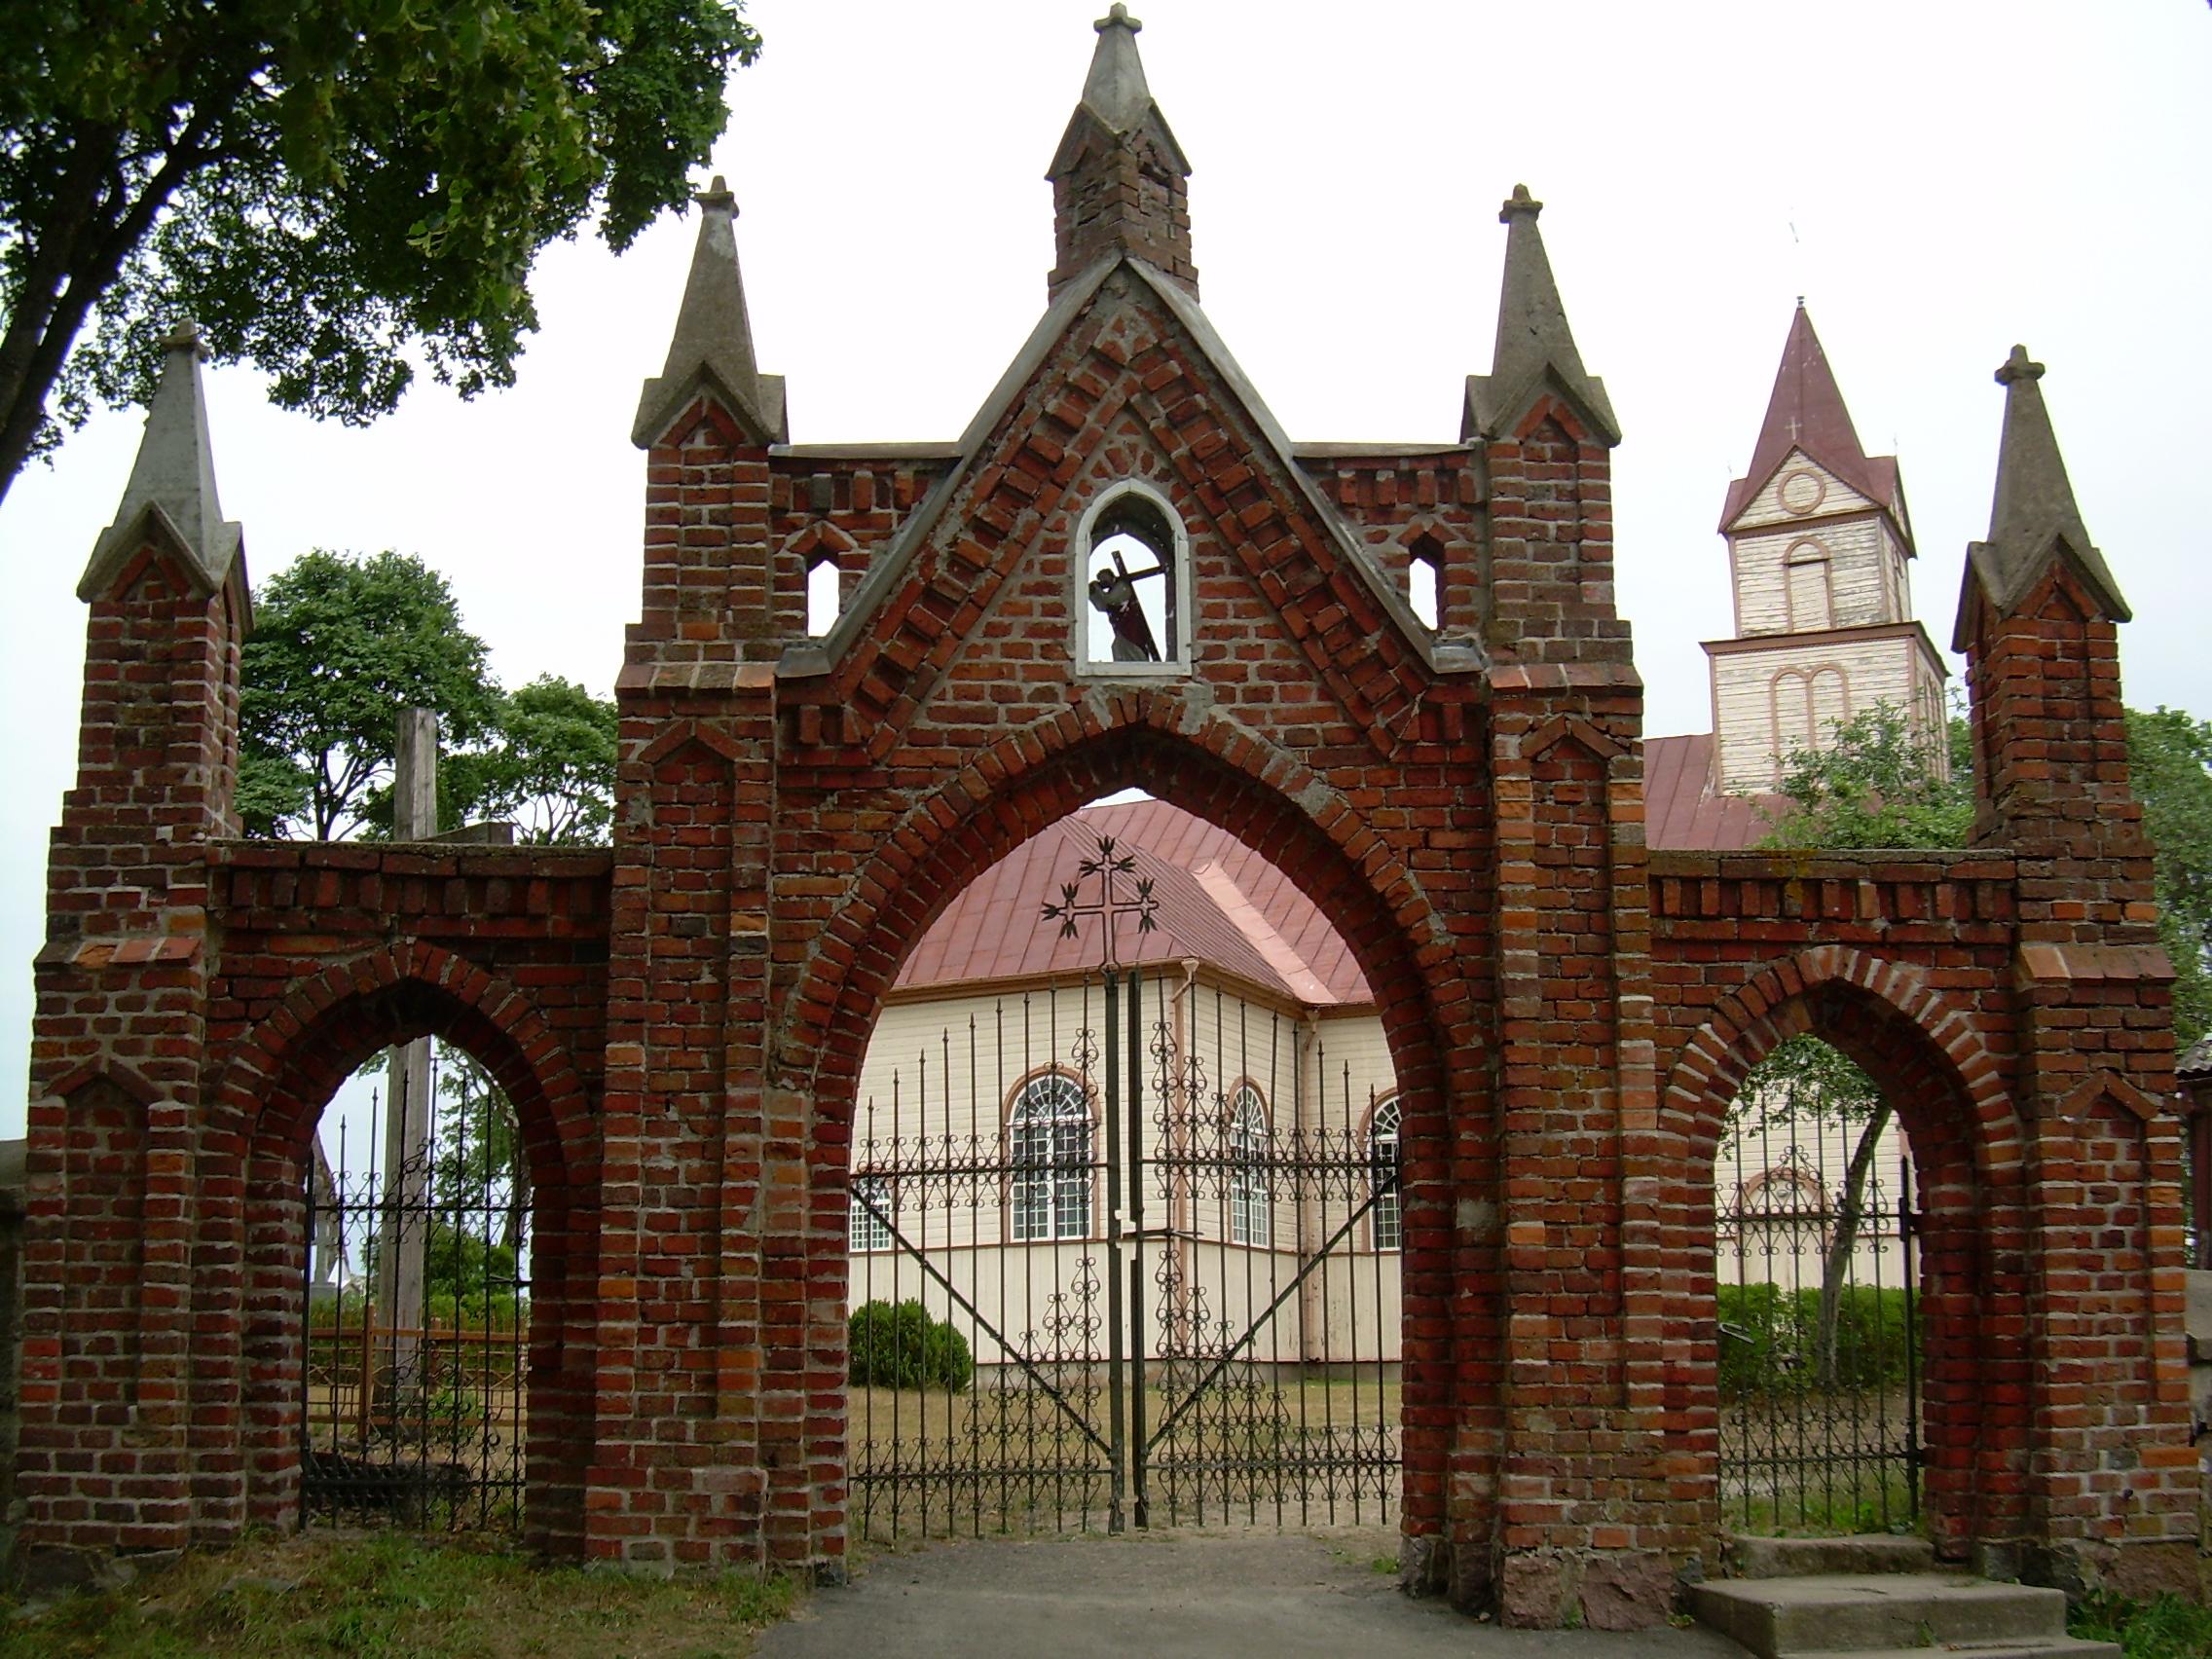 File:BZN Lieplauke church gate.jpg - Wikimedia Commons